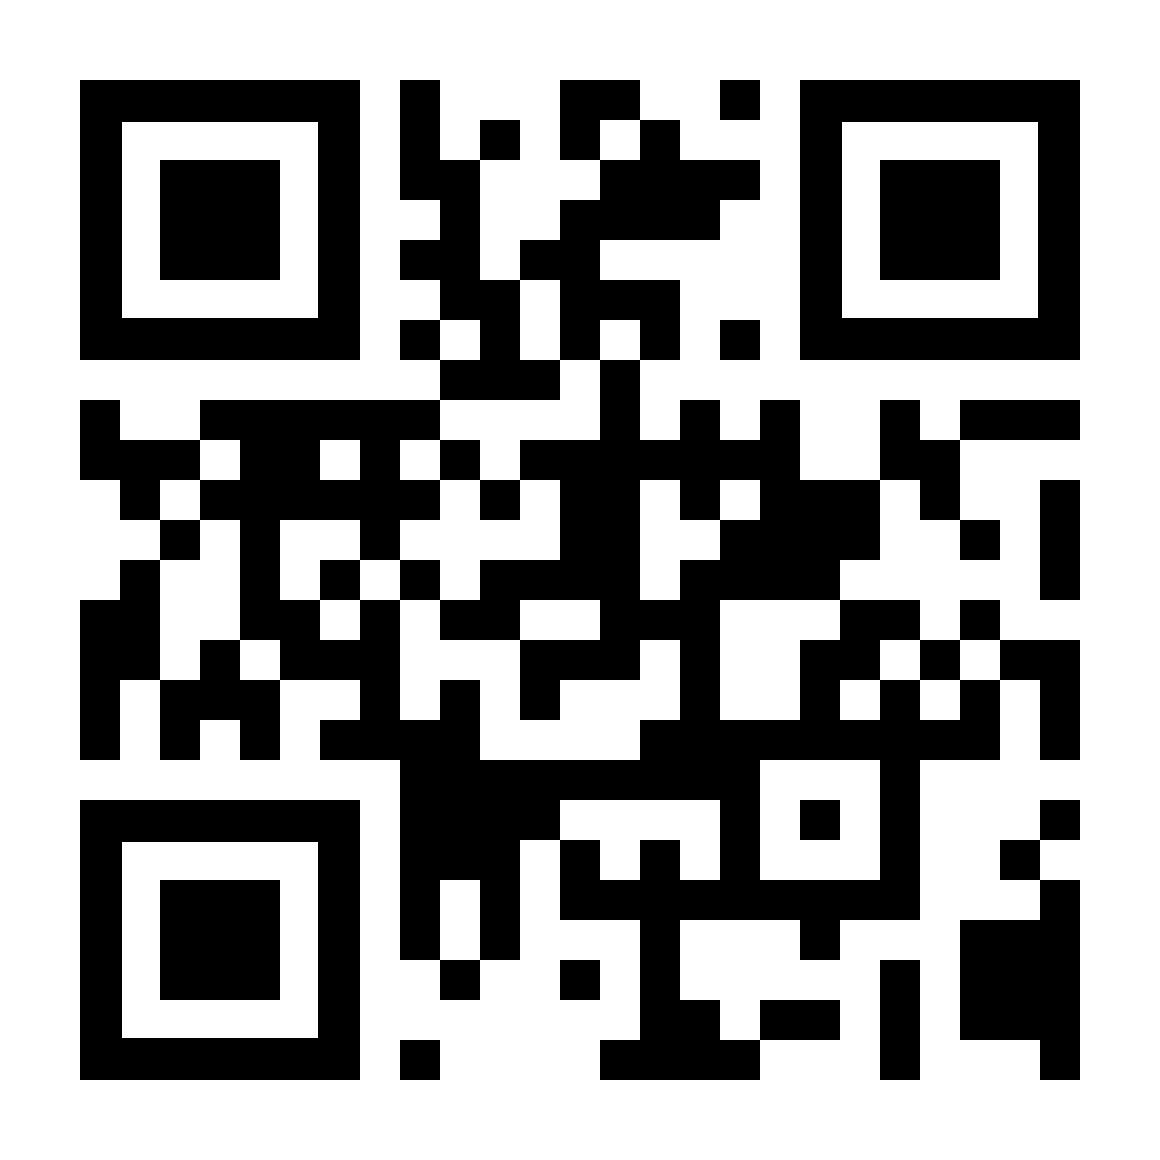 qr-code-mobil70.png